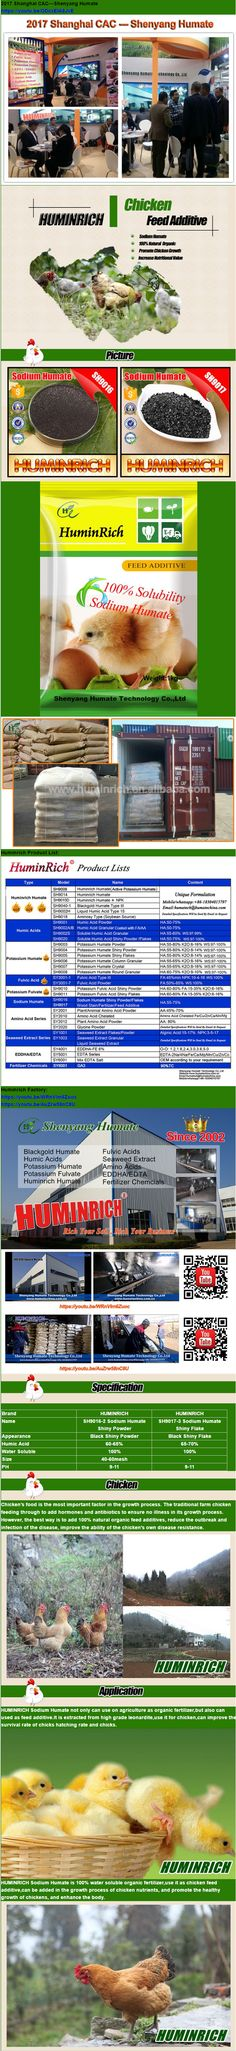 HuminRich SH9017 Sodium Humate Animal Feed Additive